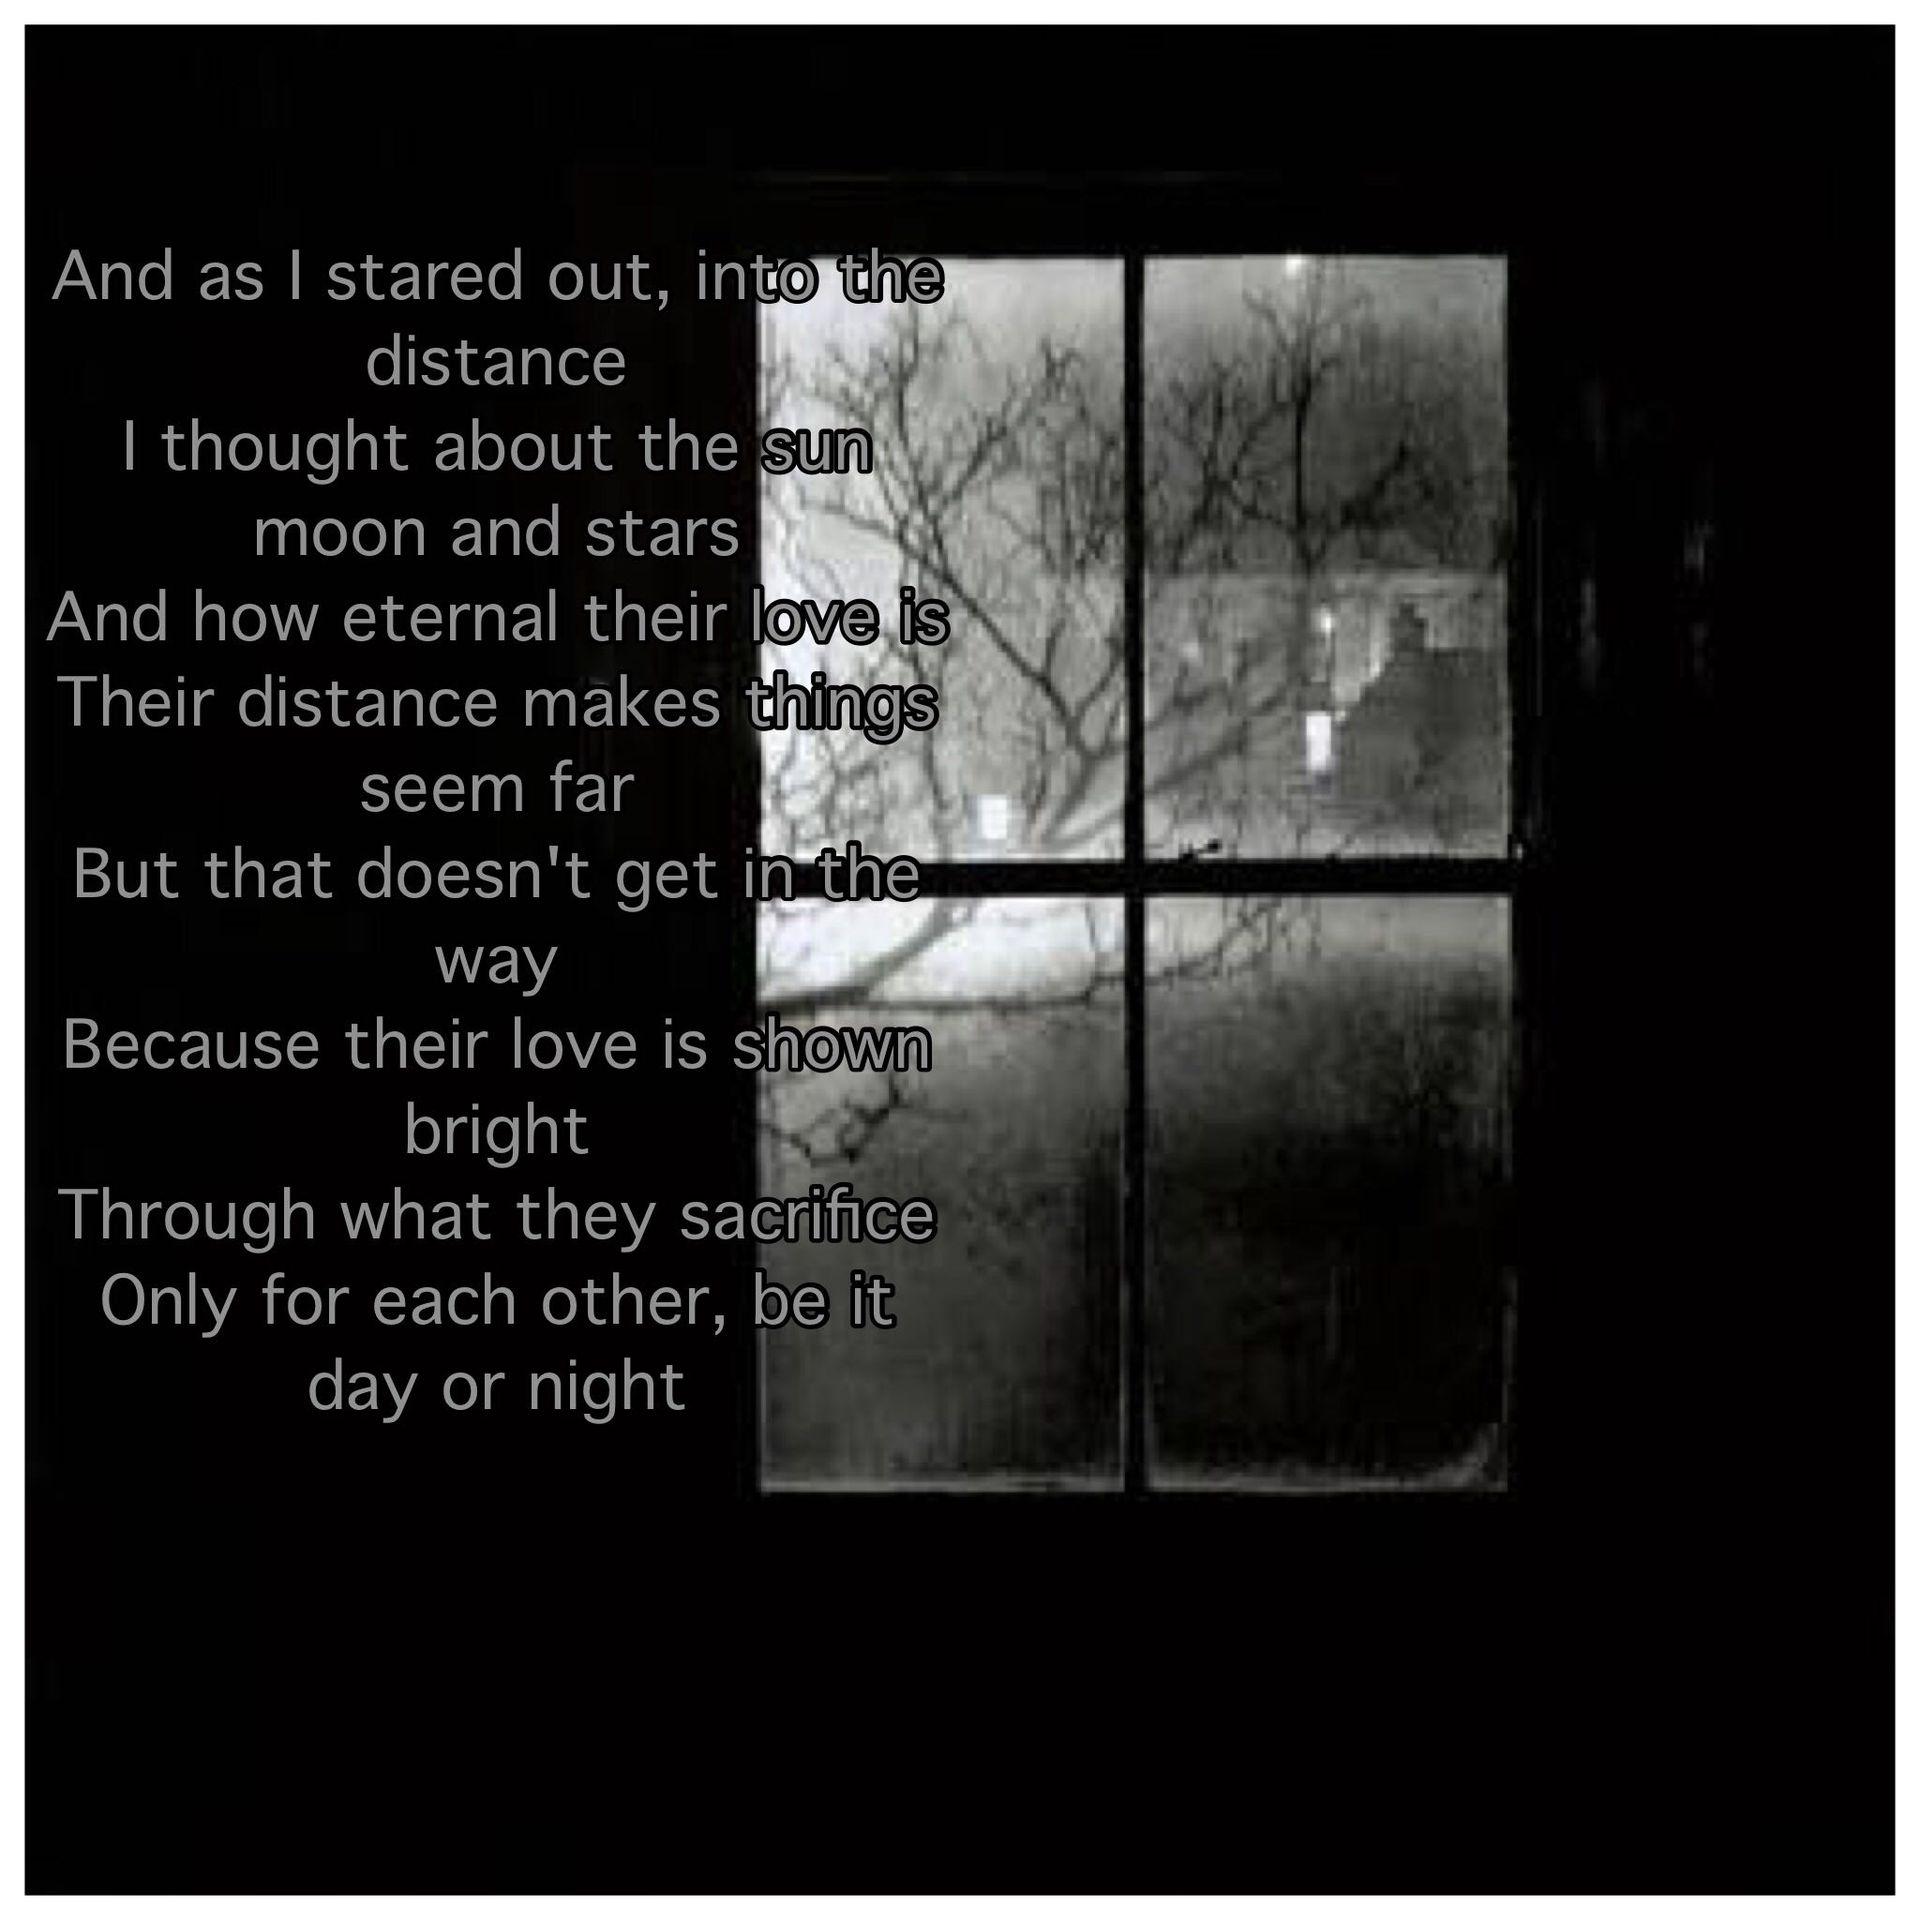 Through poetry, I fly - WINDOWS - Wattpad